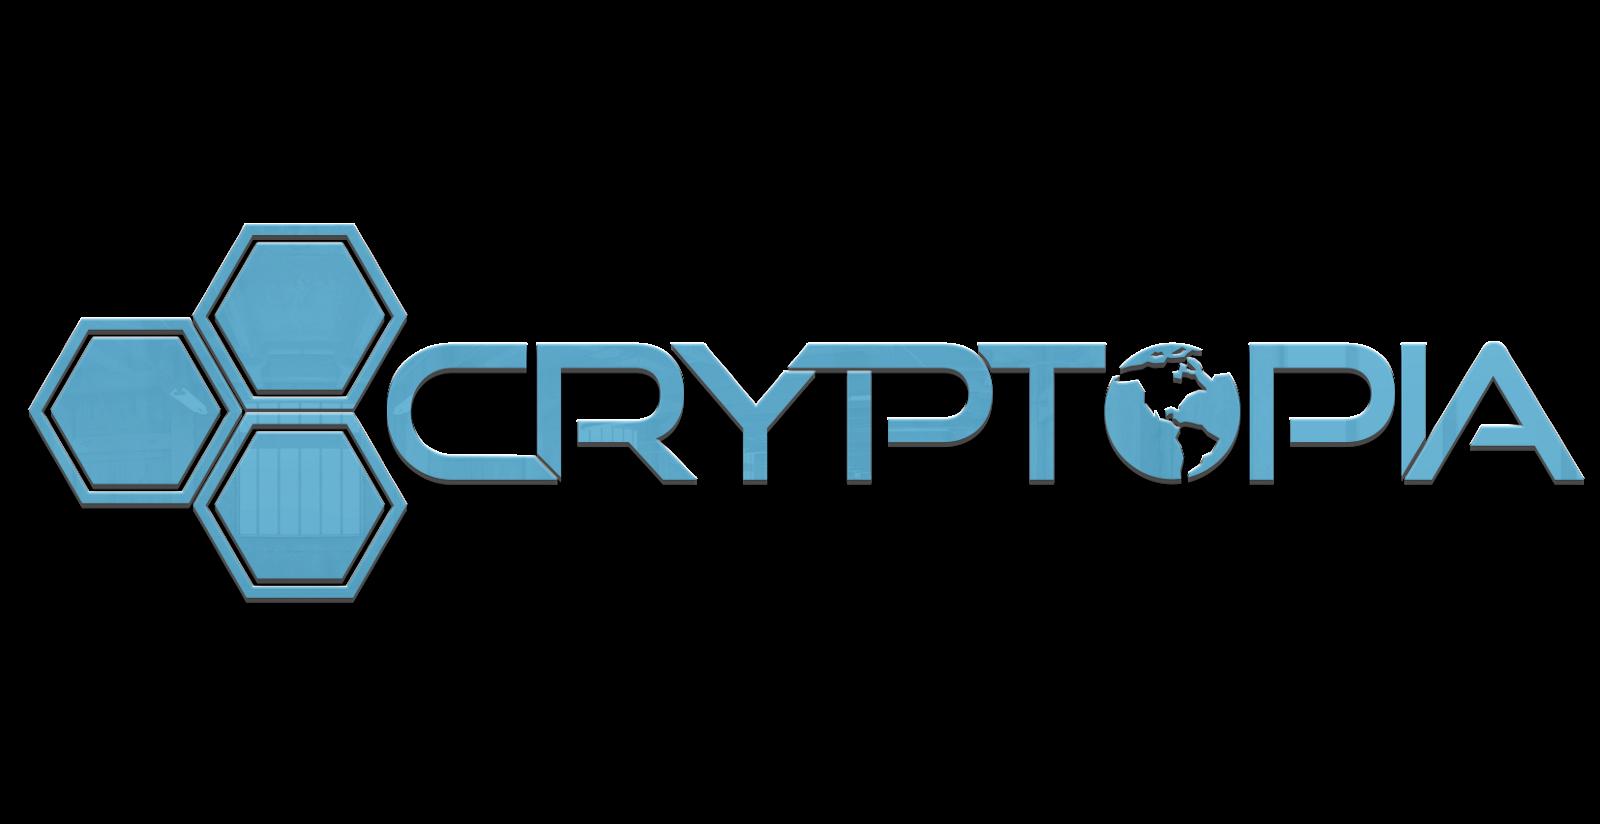 Cryptopia PNG logo